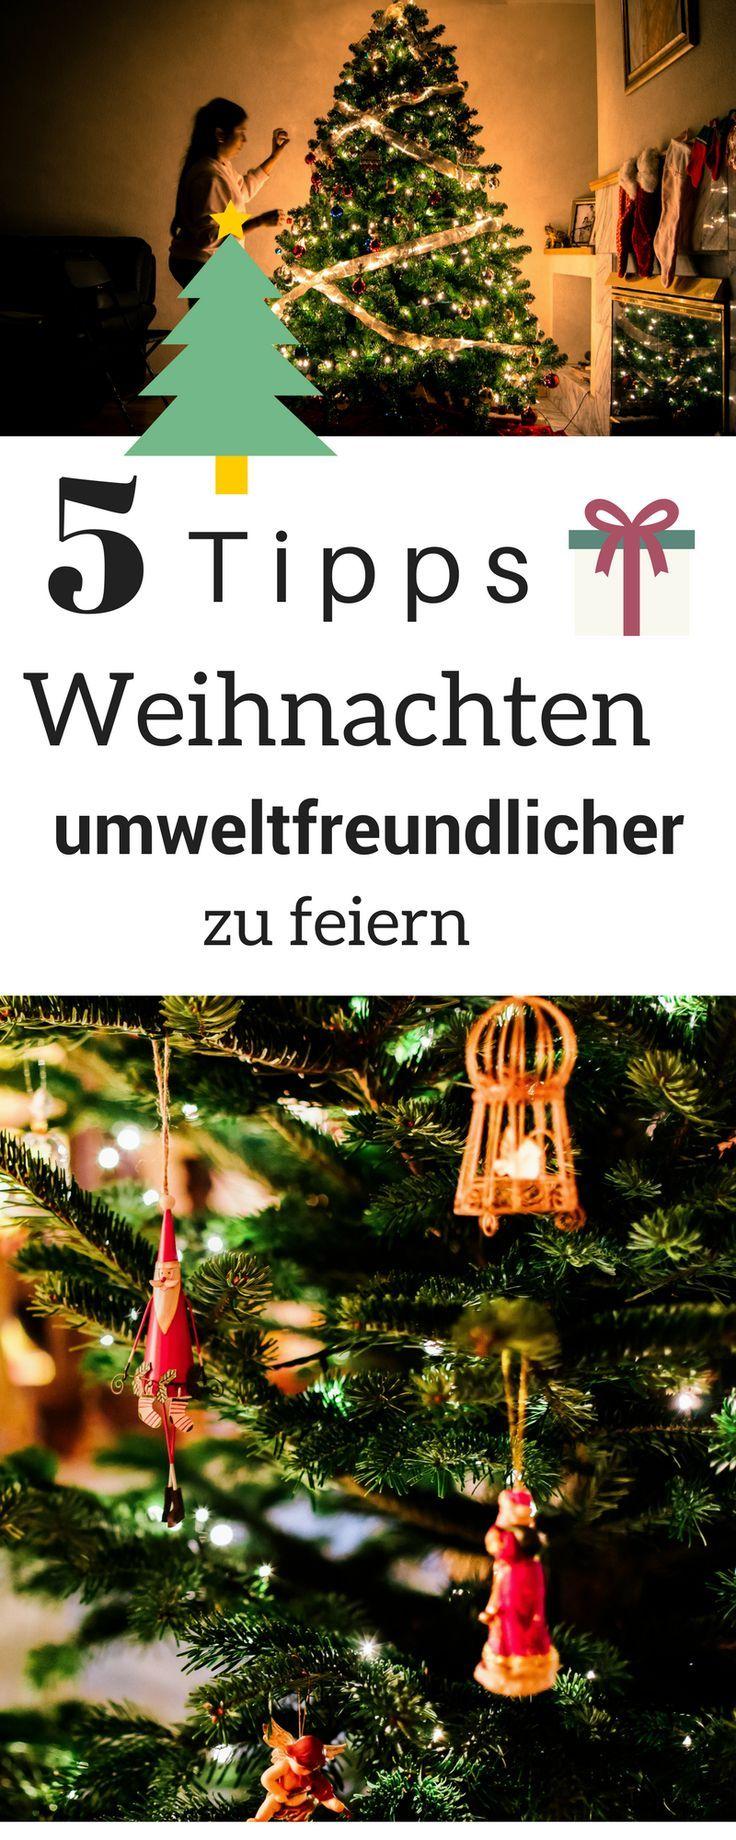 Weihnachten ökologischer feiern - 5 Tipps - so gehts! | CHRISTMAS ...